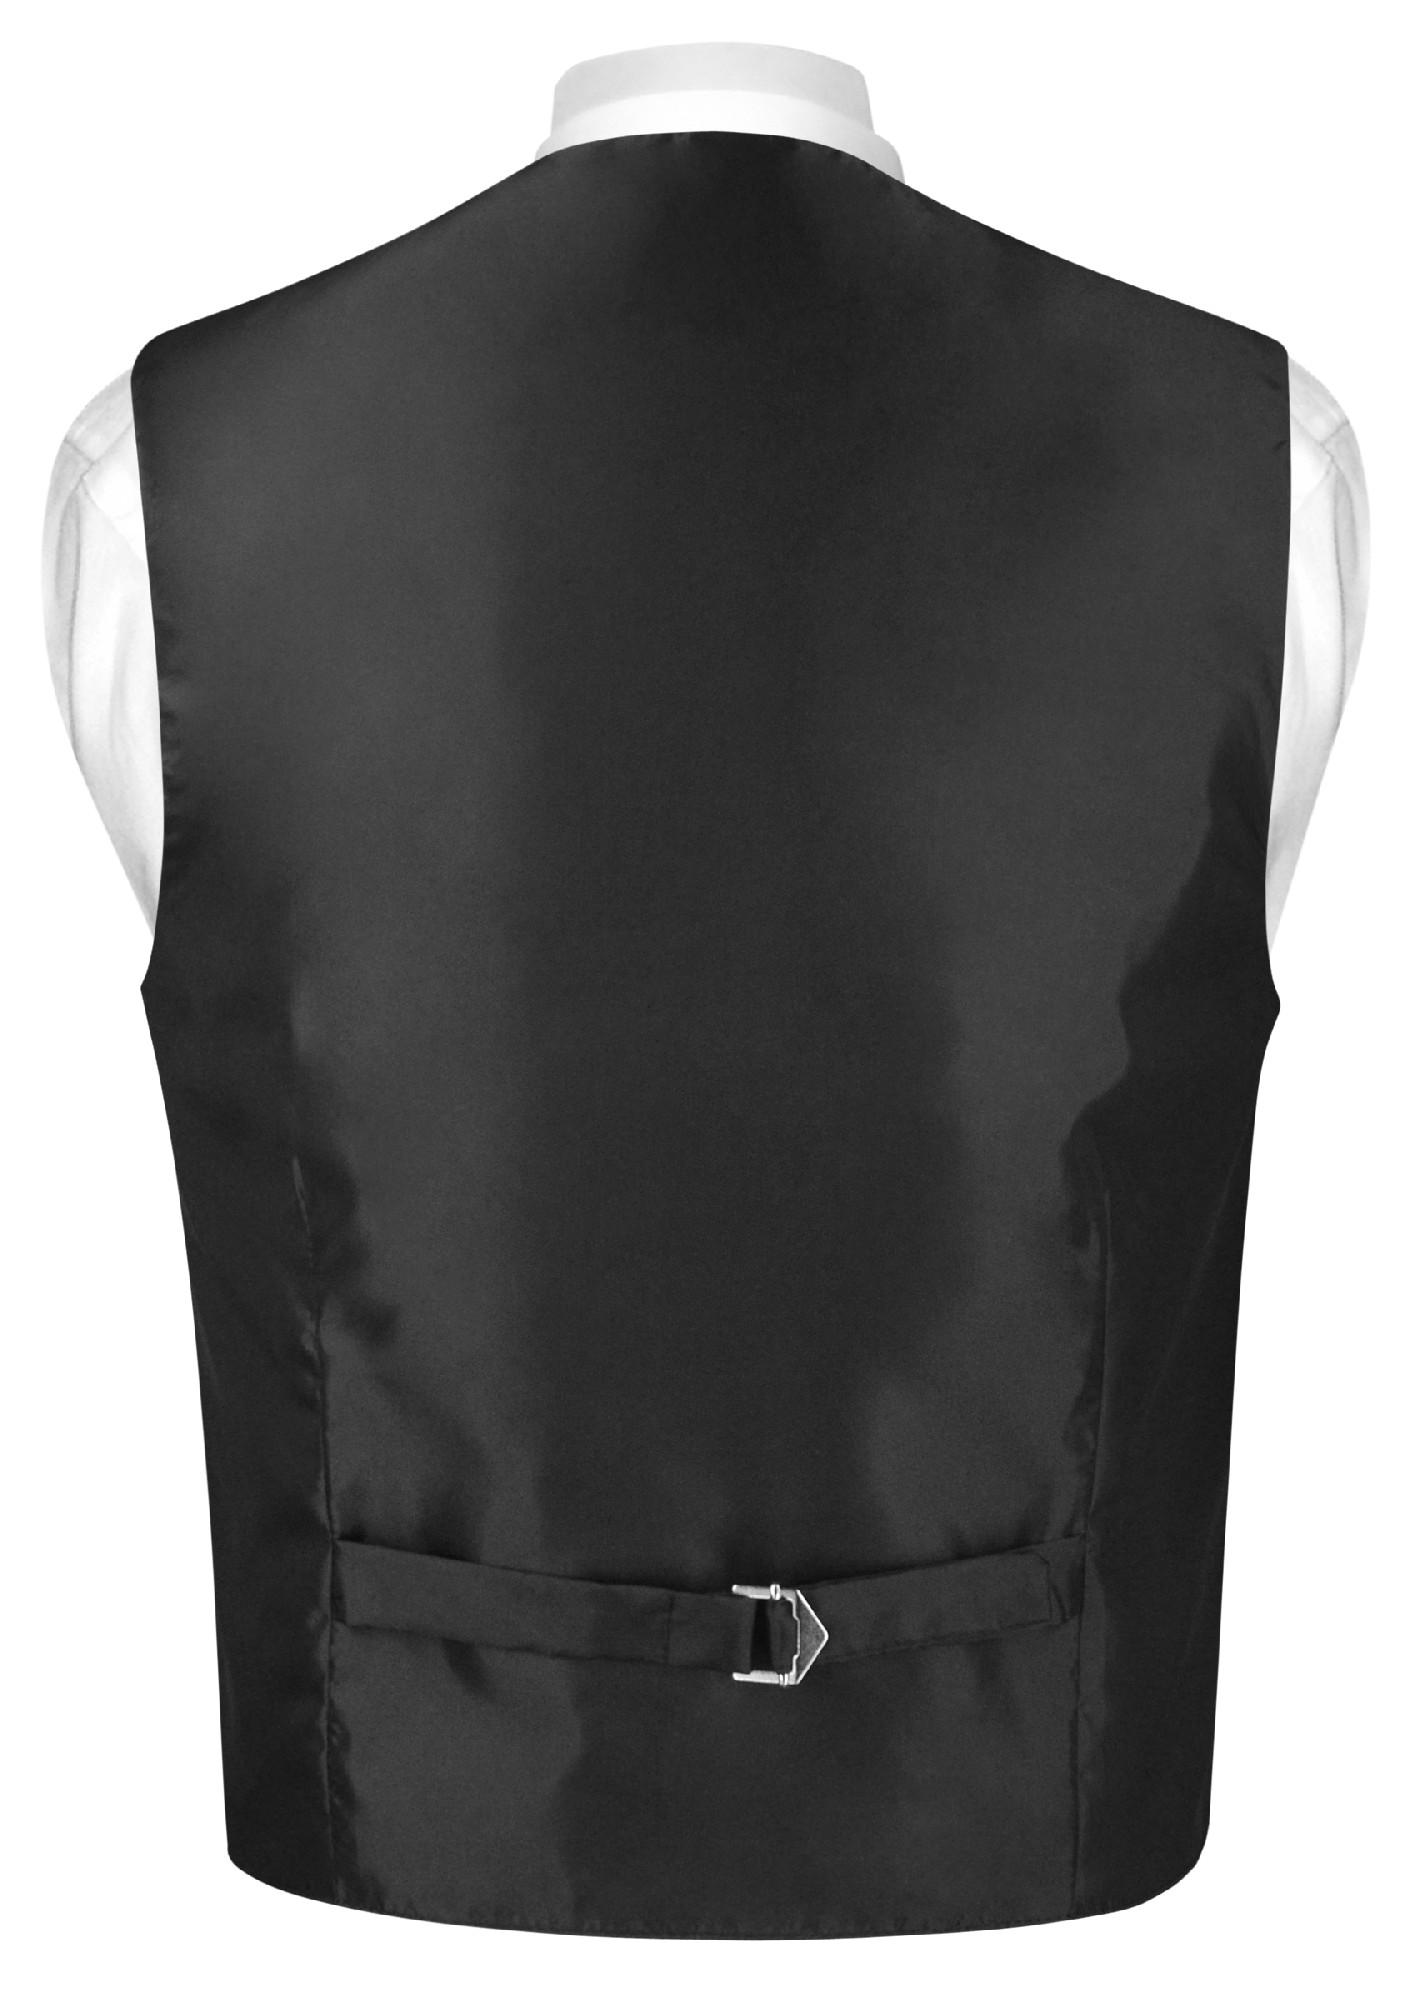 Boys Dress Vest and Neck Tie Solid Chocolate Brown NeckTie Set